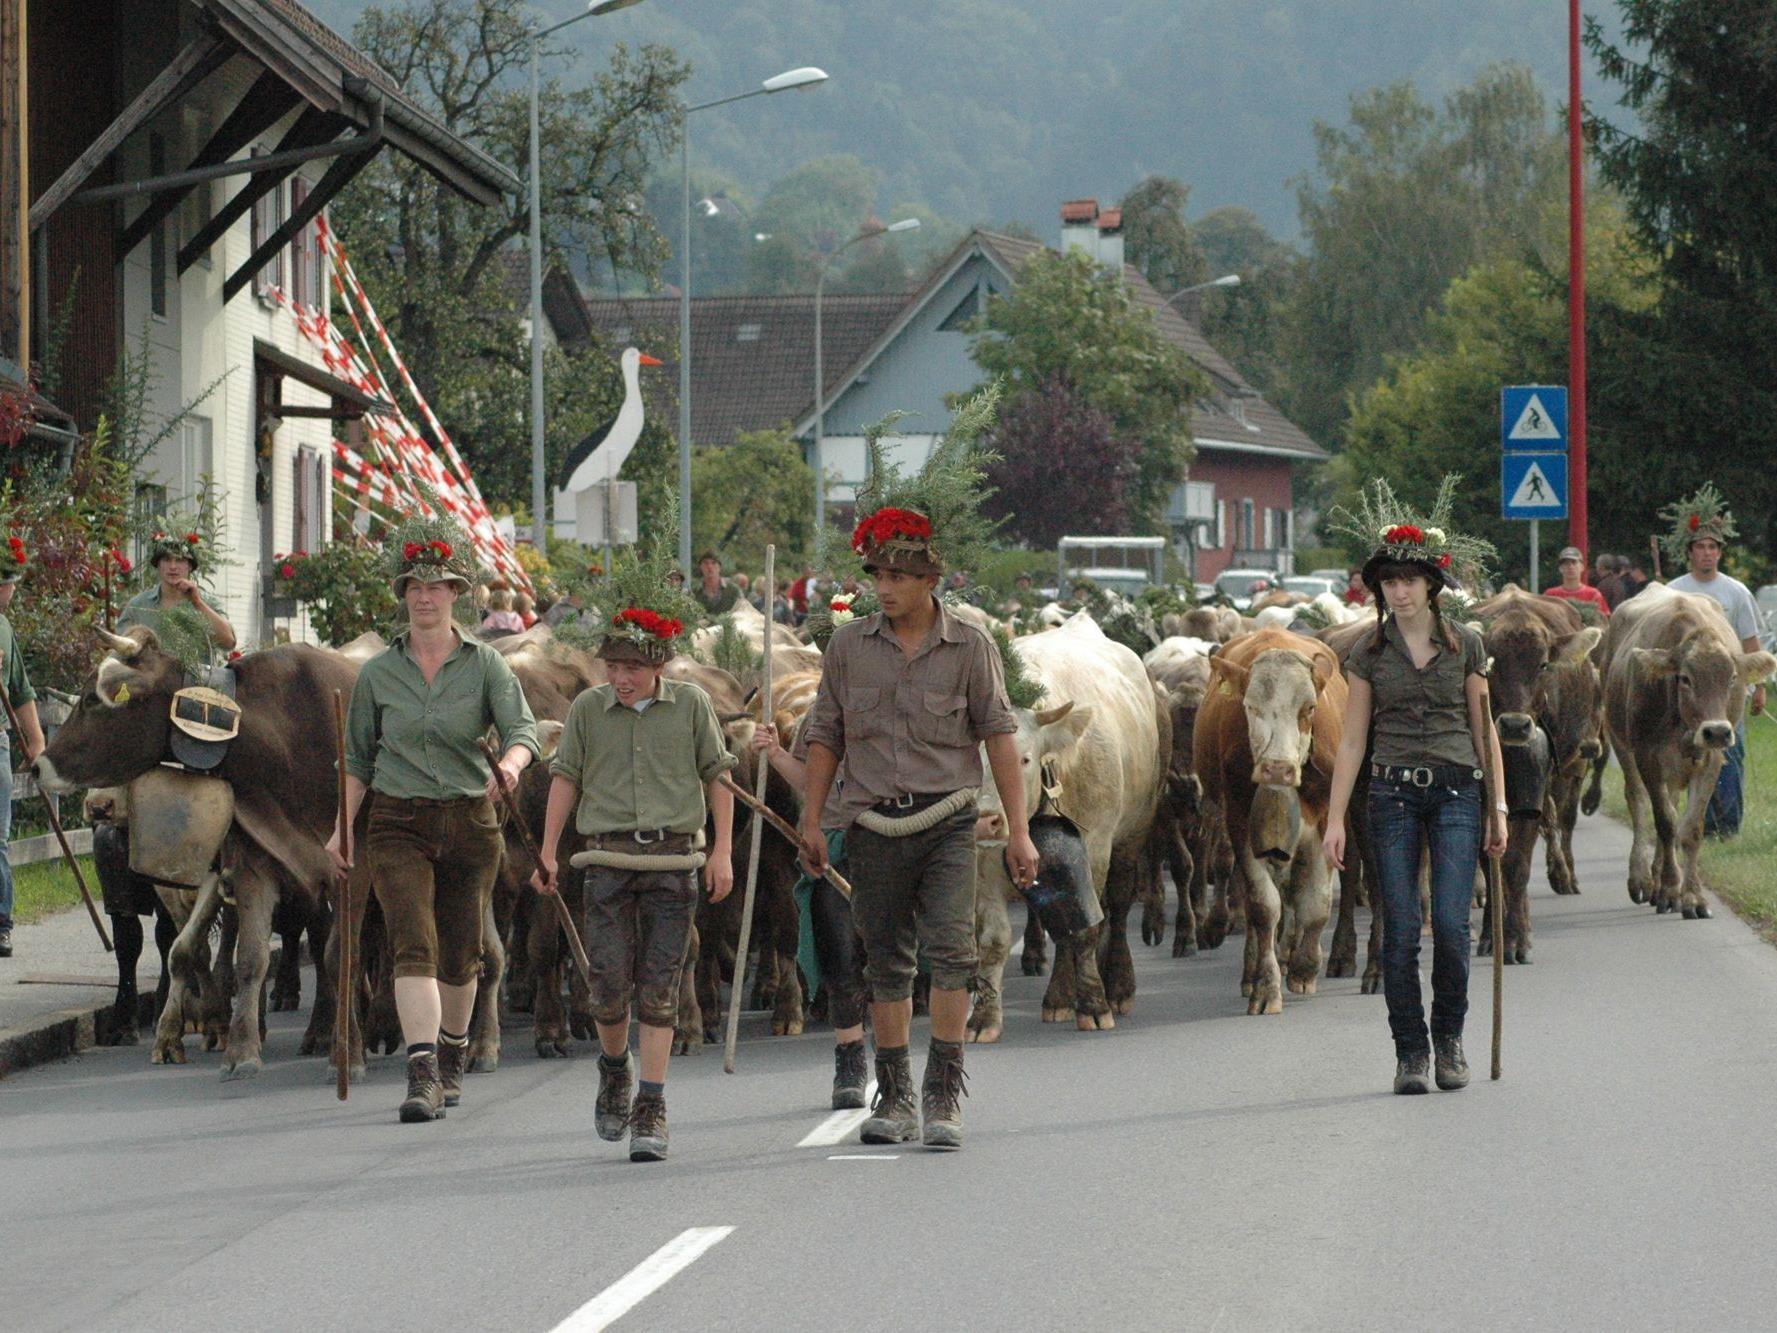 Am Samstag ist Almabtrieb in Sulz.